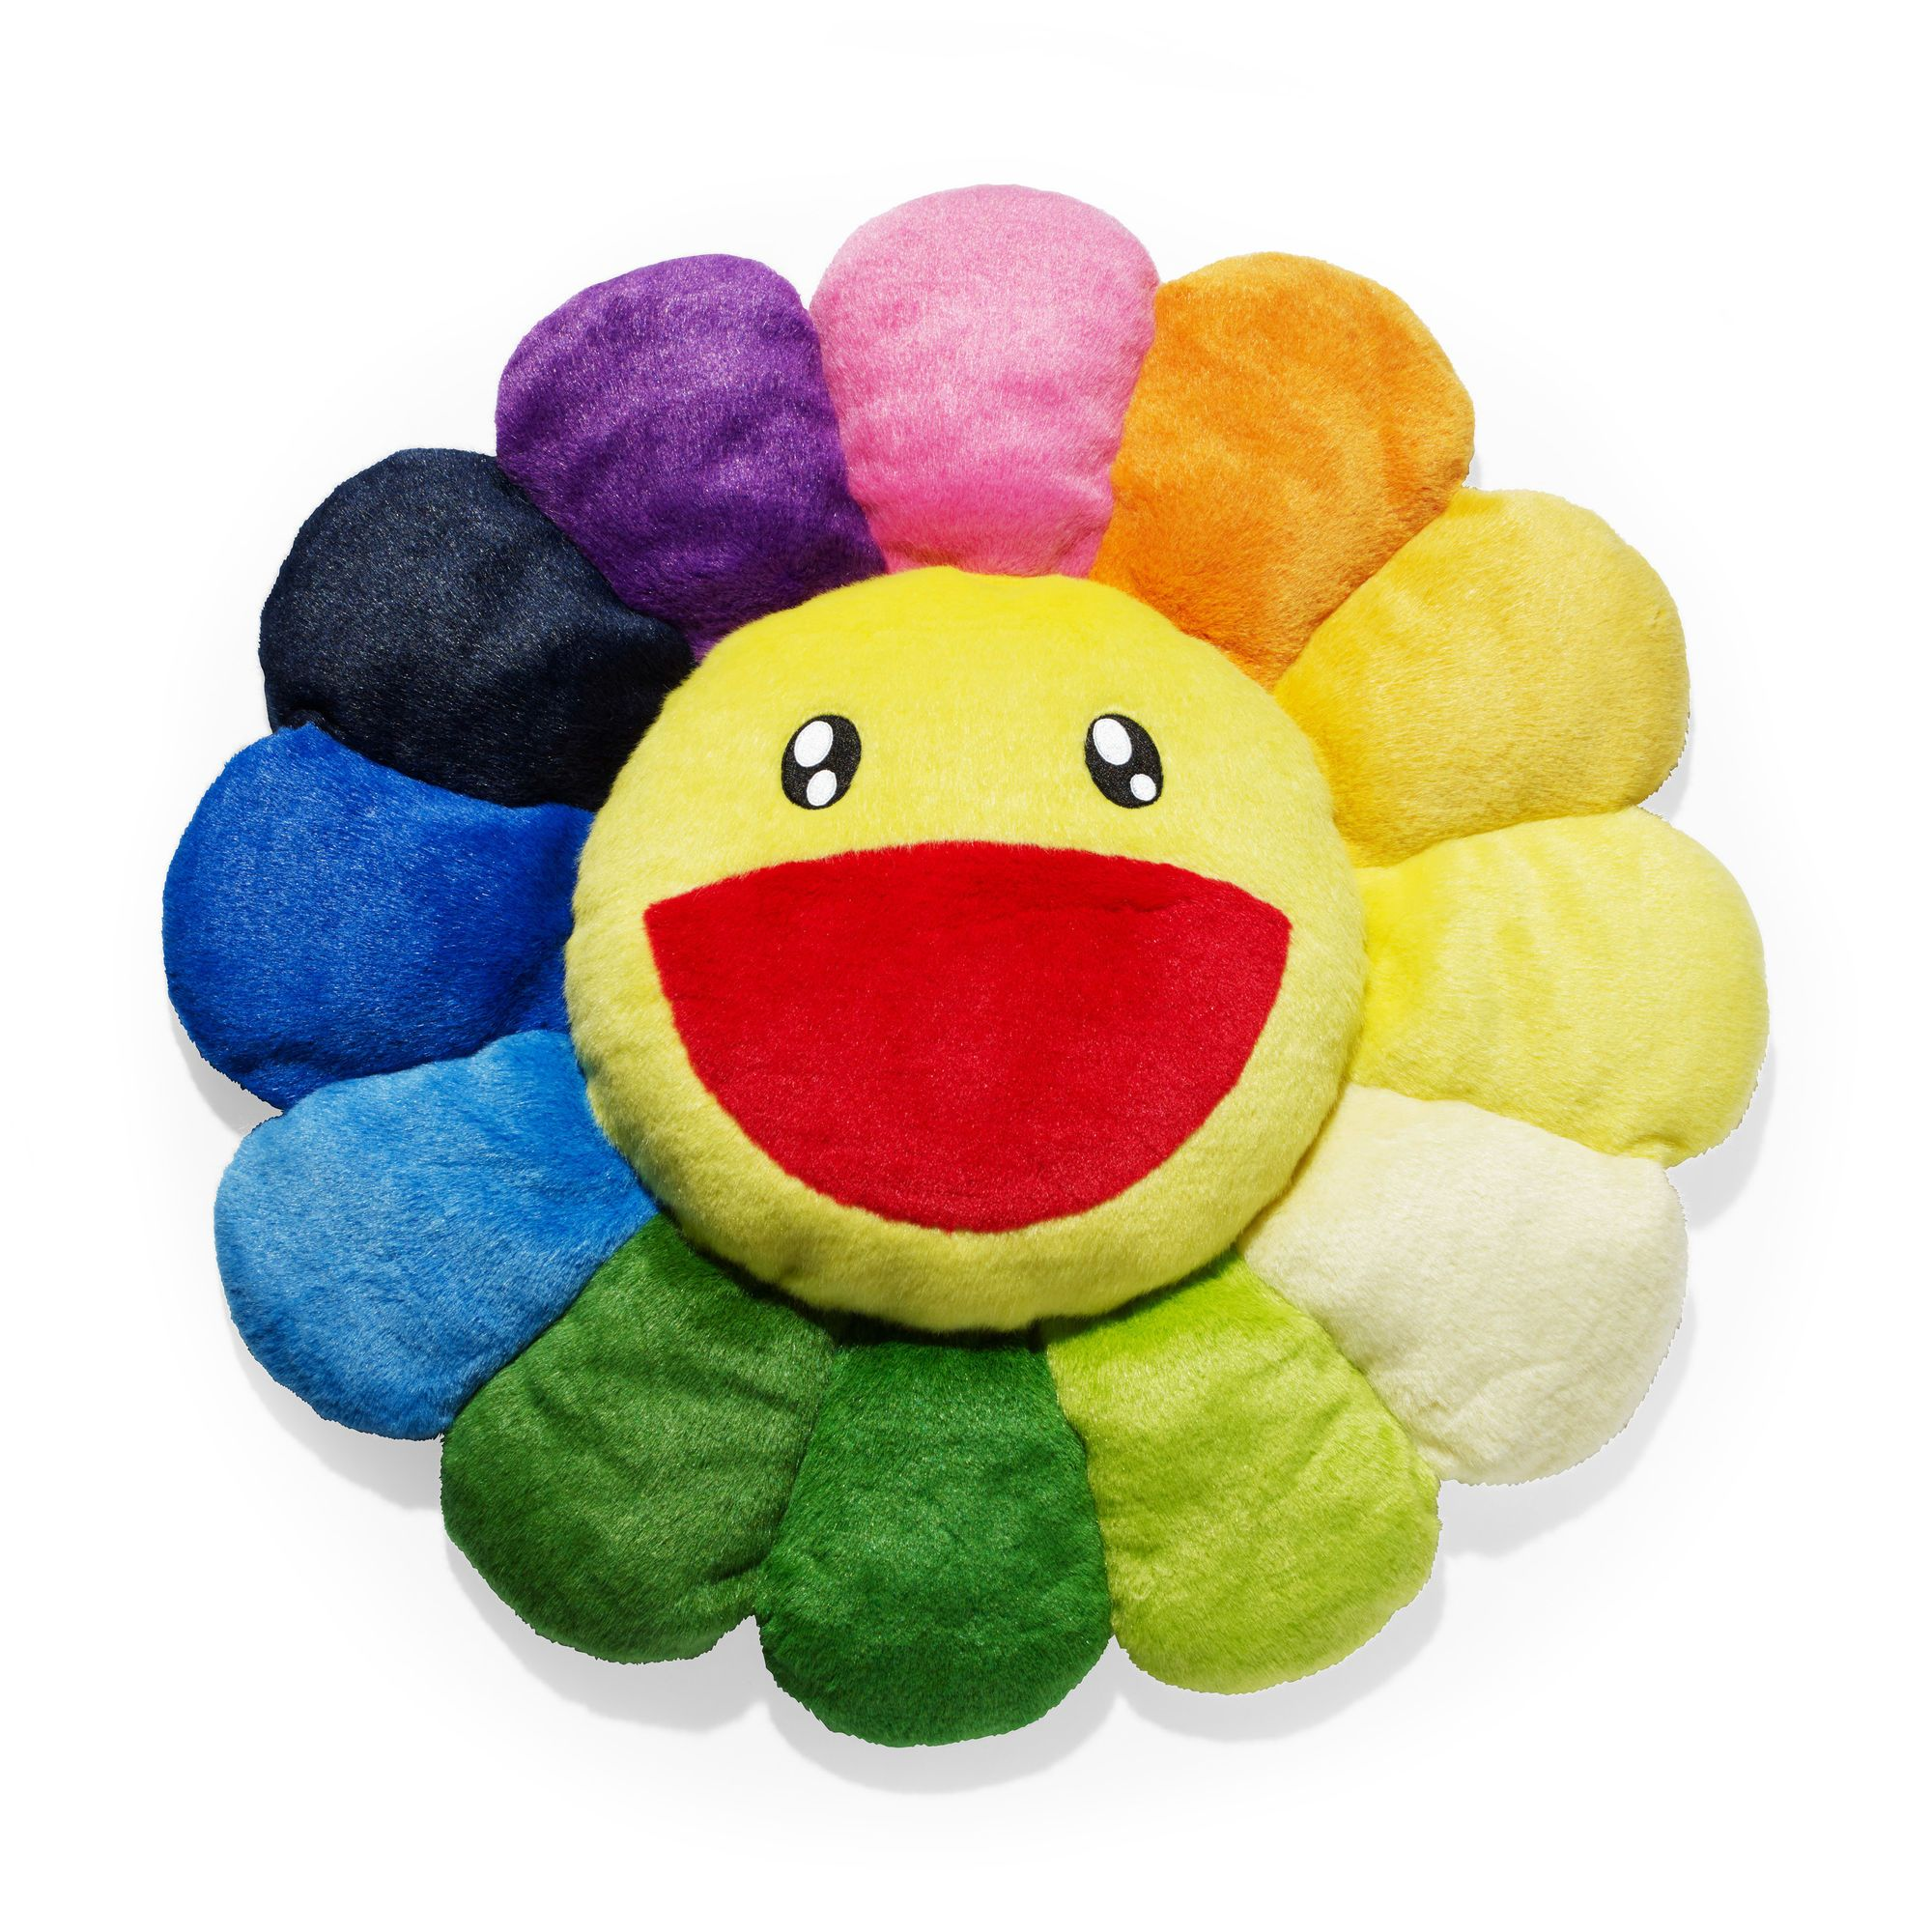 Plush Murakami Flower Cushion in color Murakami flower